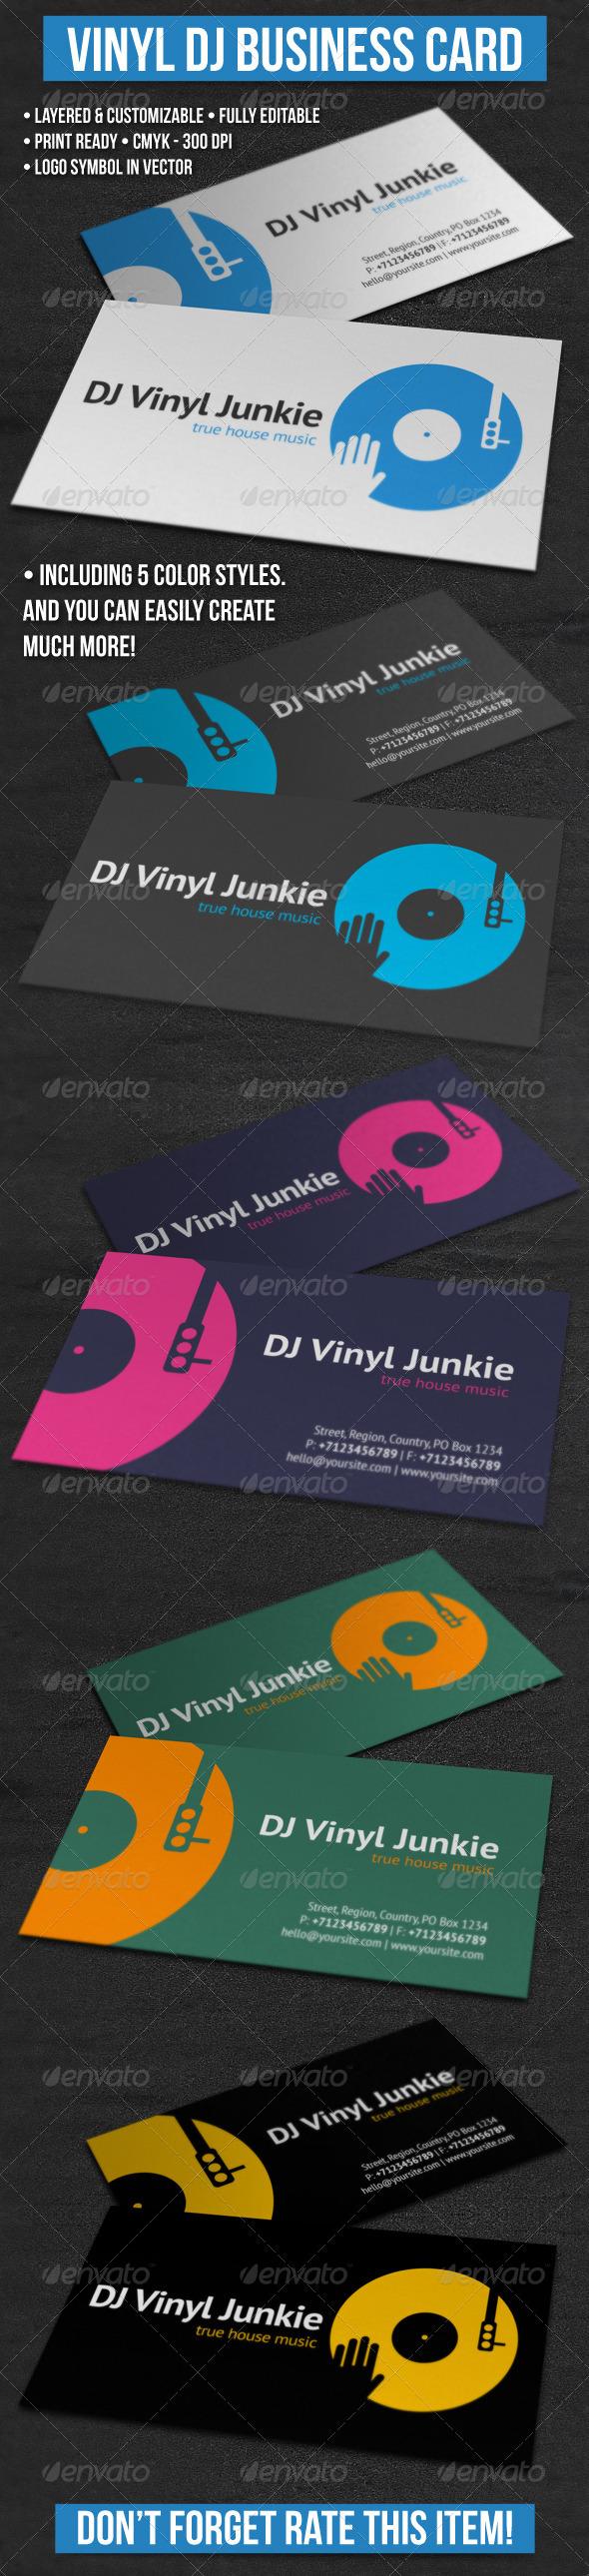 GraphicRiver Vinyl DJ Business Card 4246081